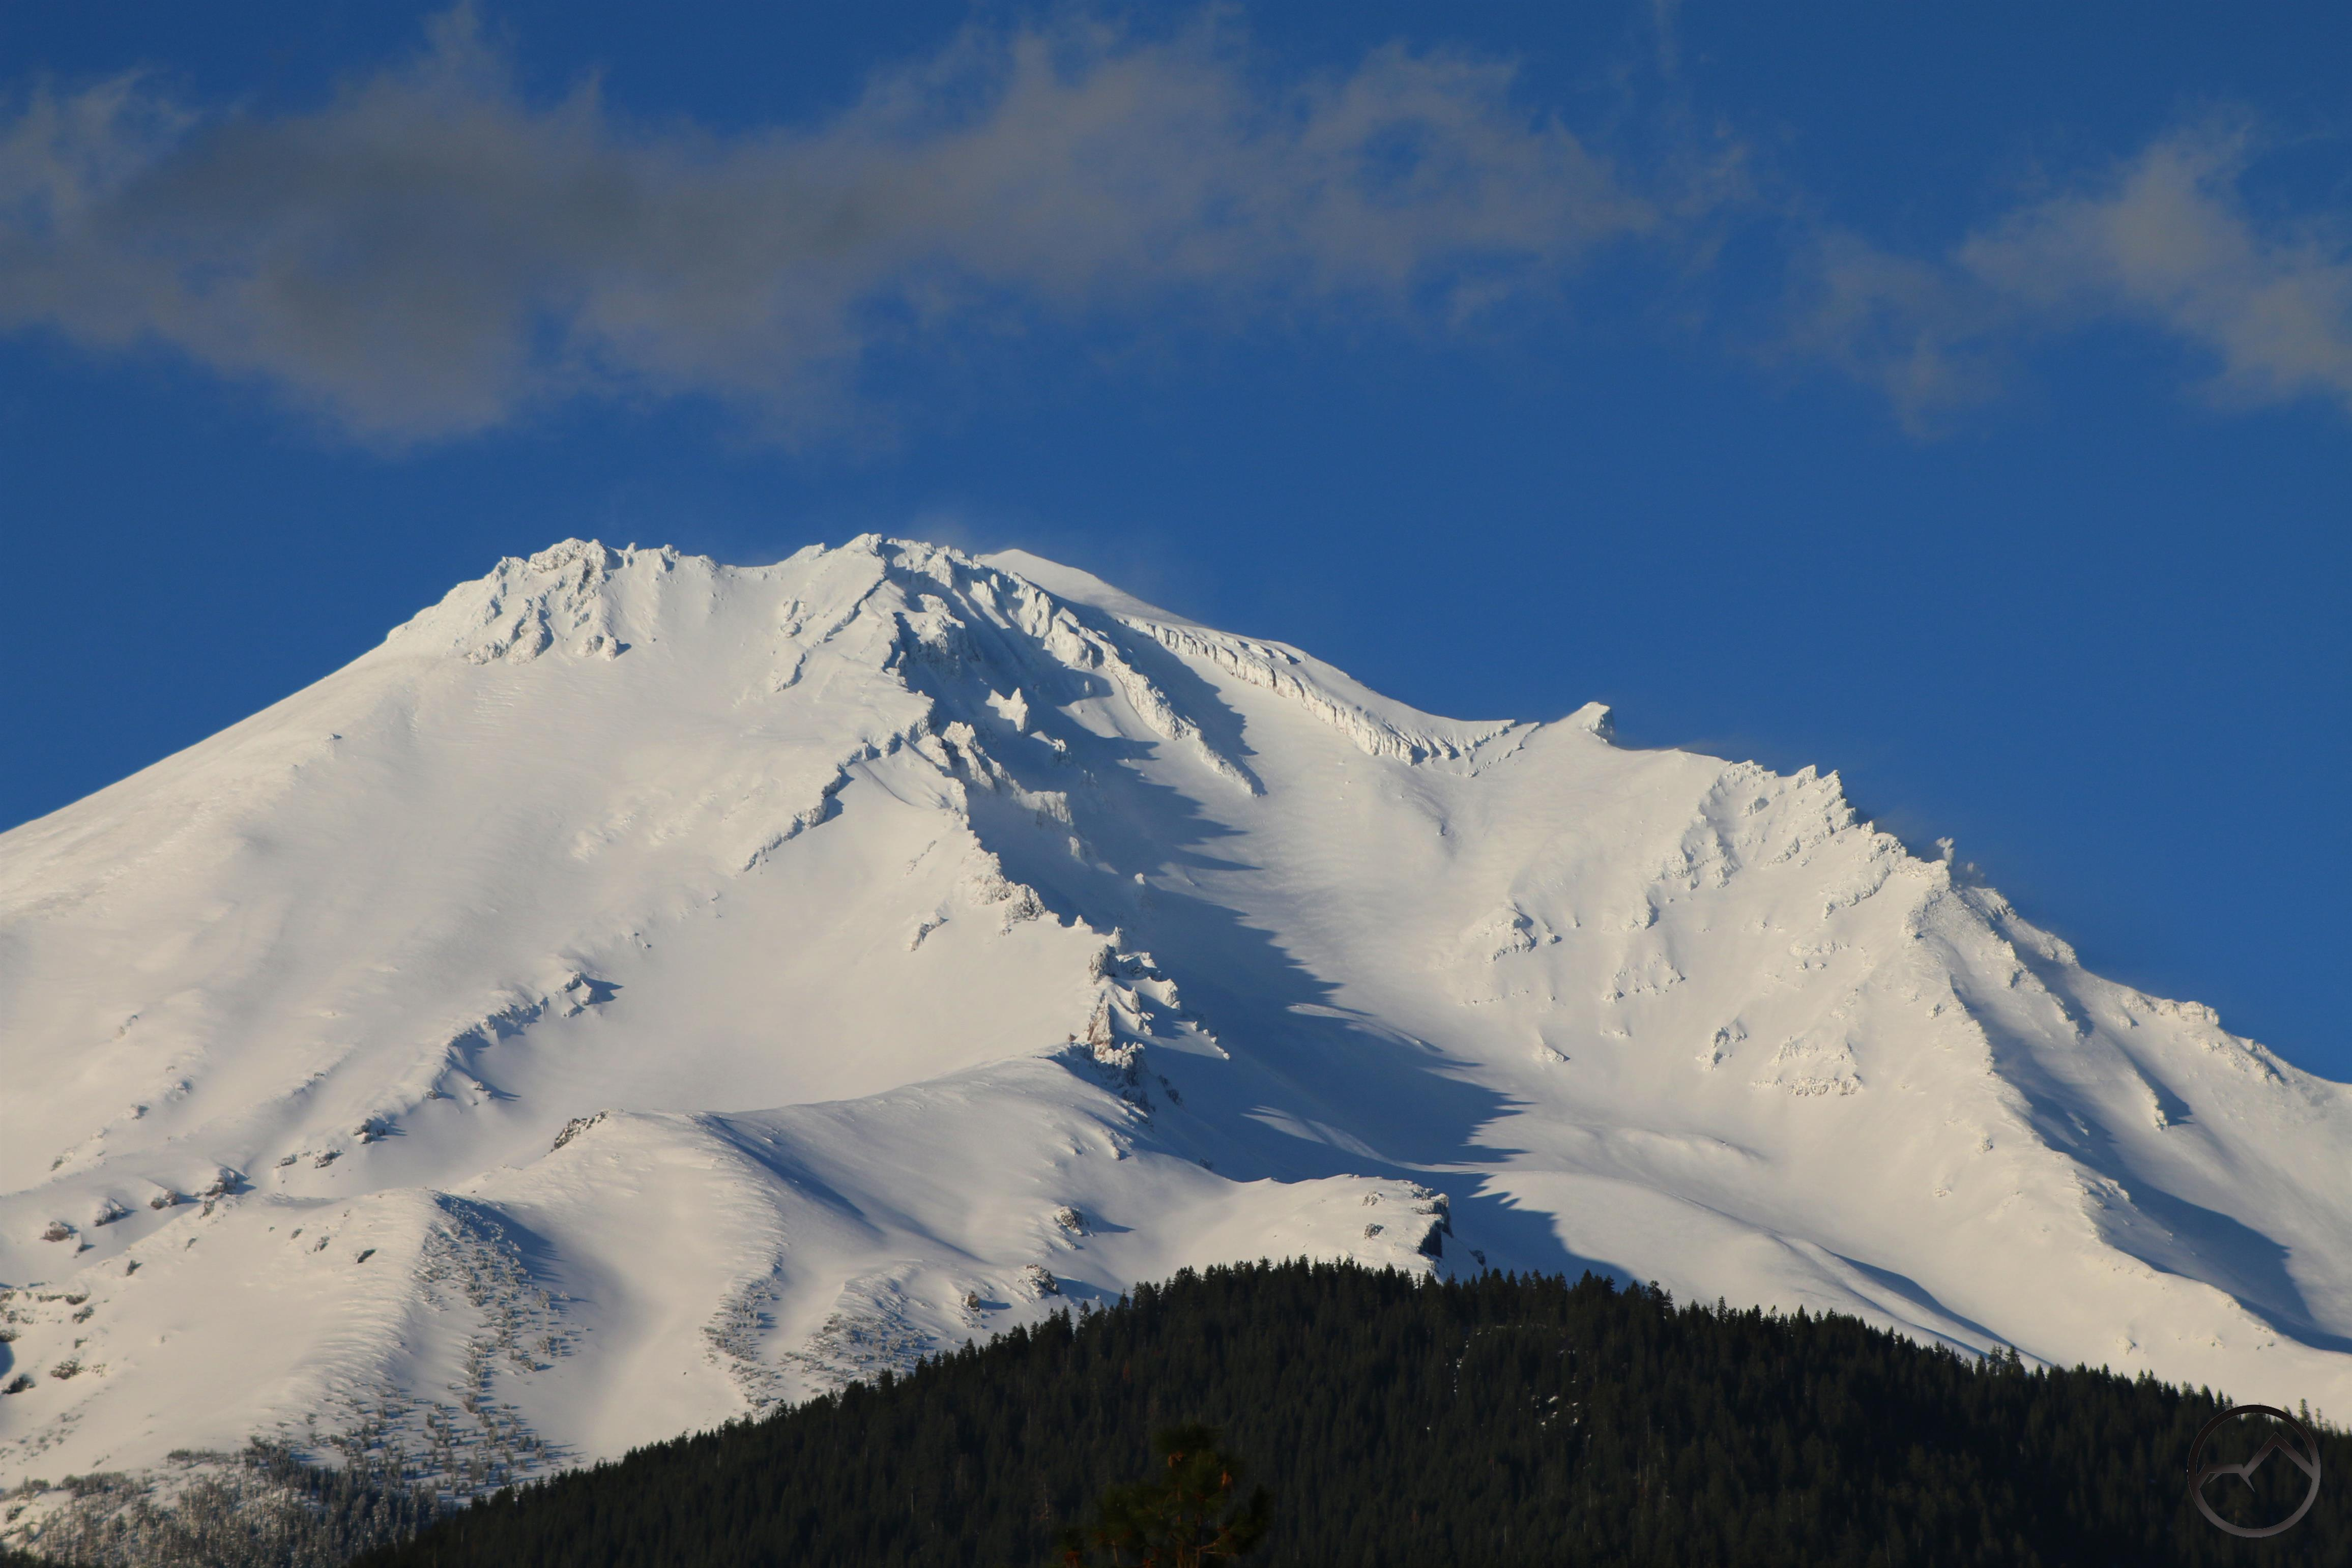 Mount Shasta | Hike Mt. Shasta